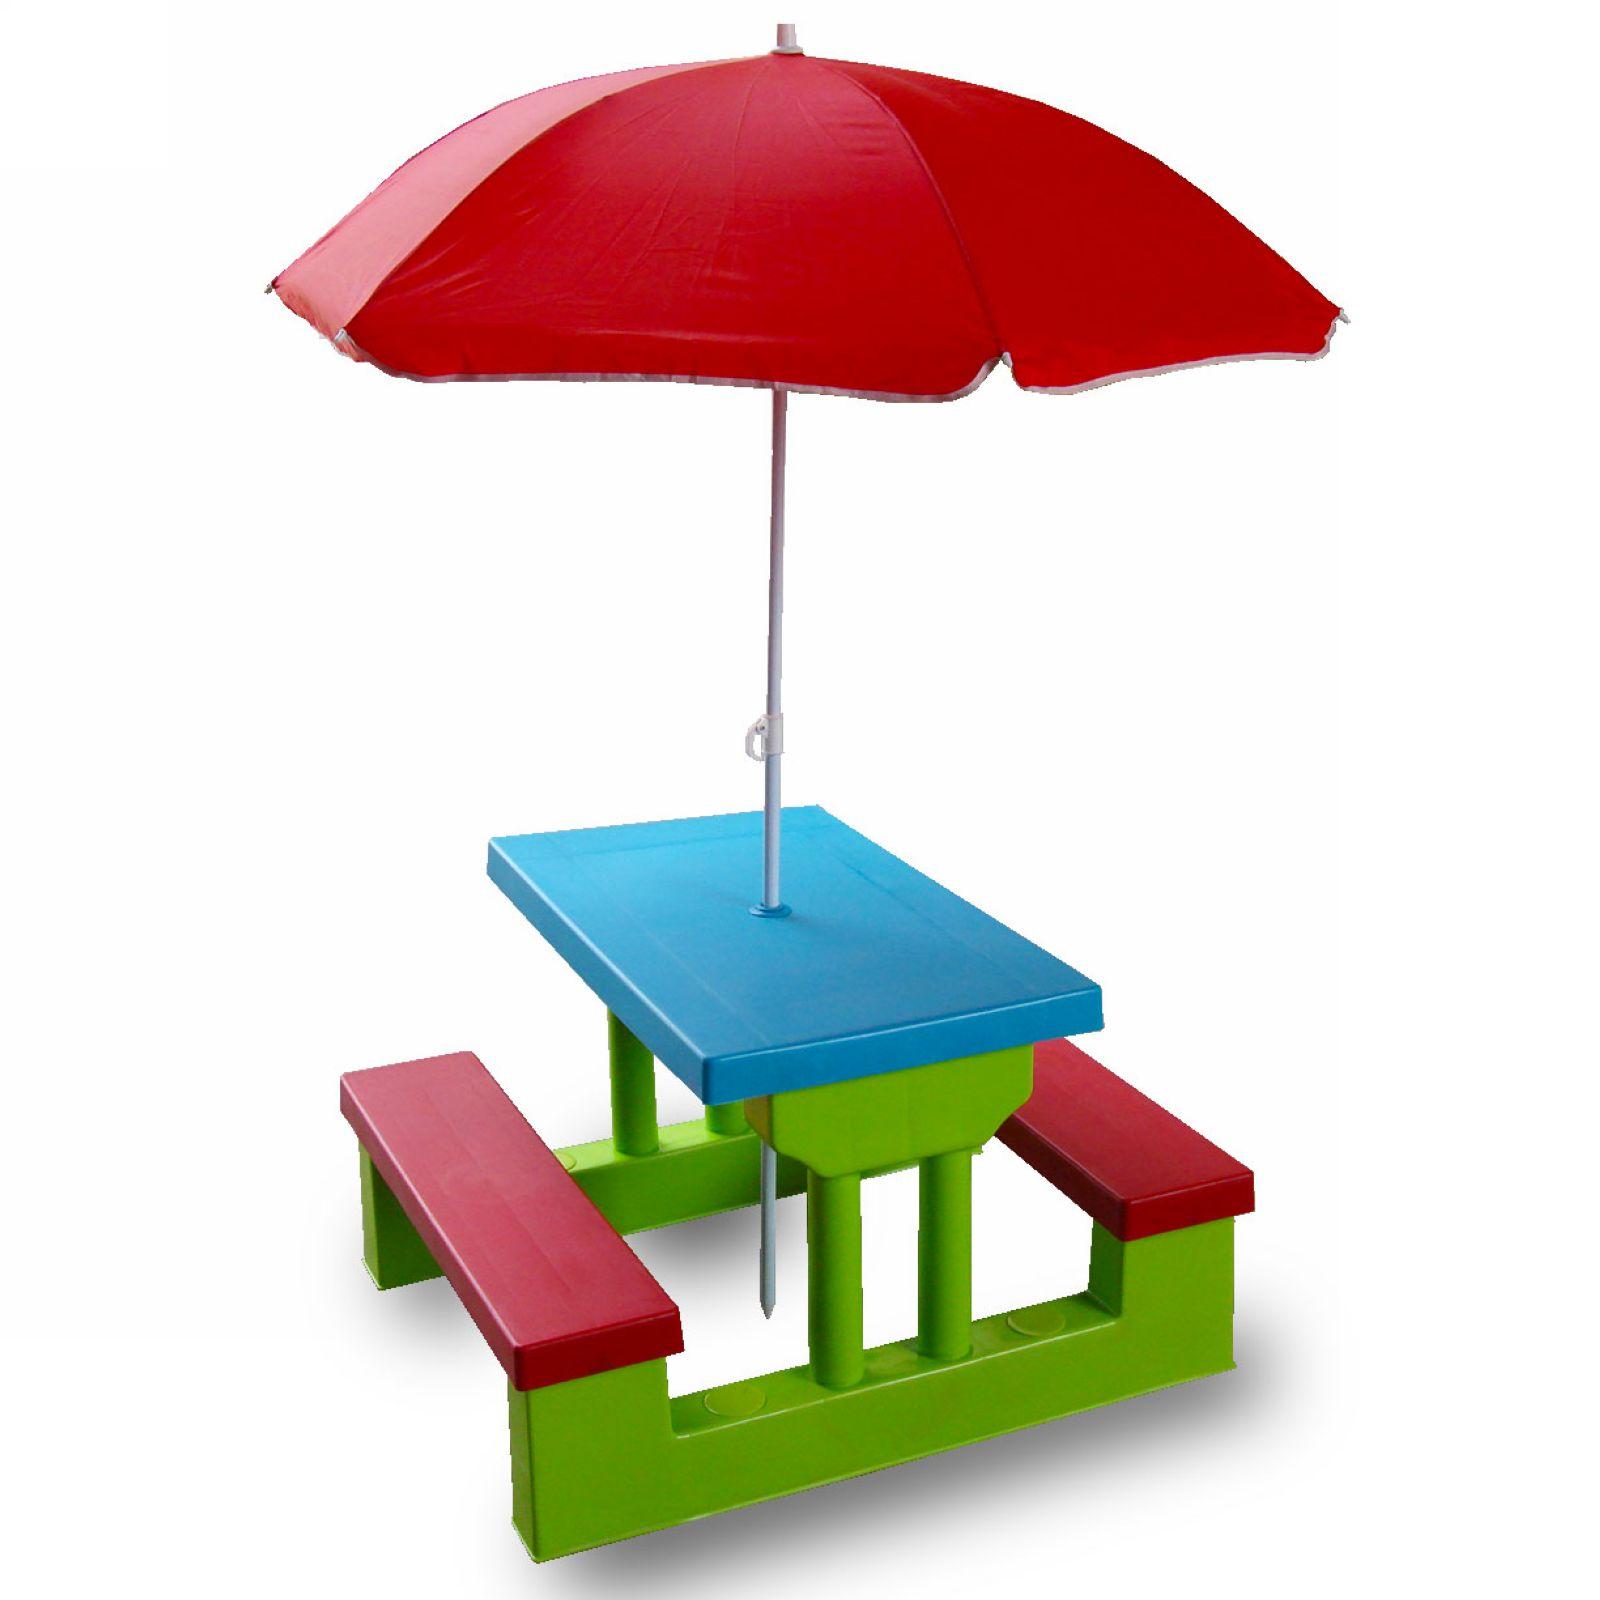 New Kids Child Picnic Garden Red Parasol Blue Table Green Bench Set 4 Children